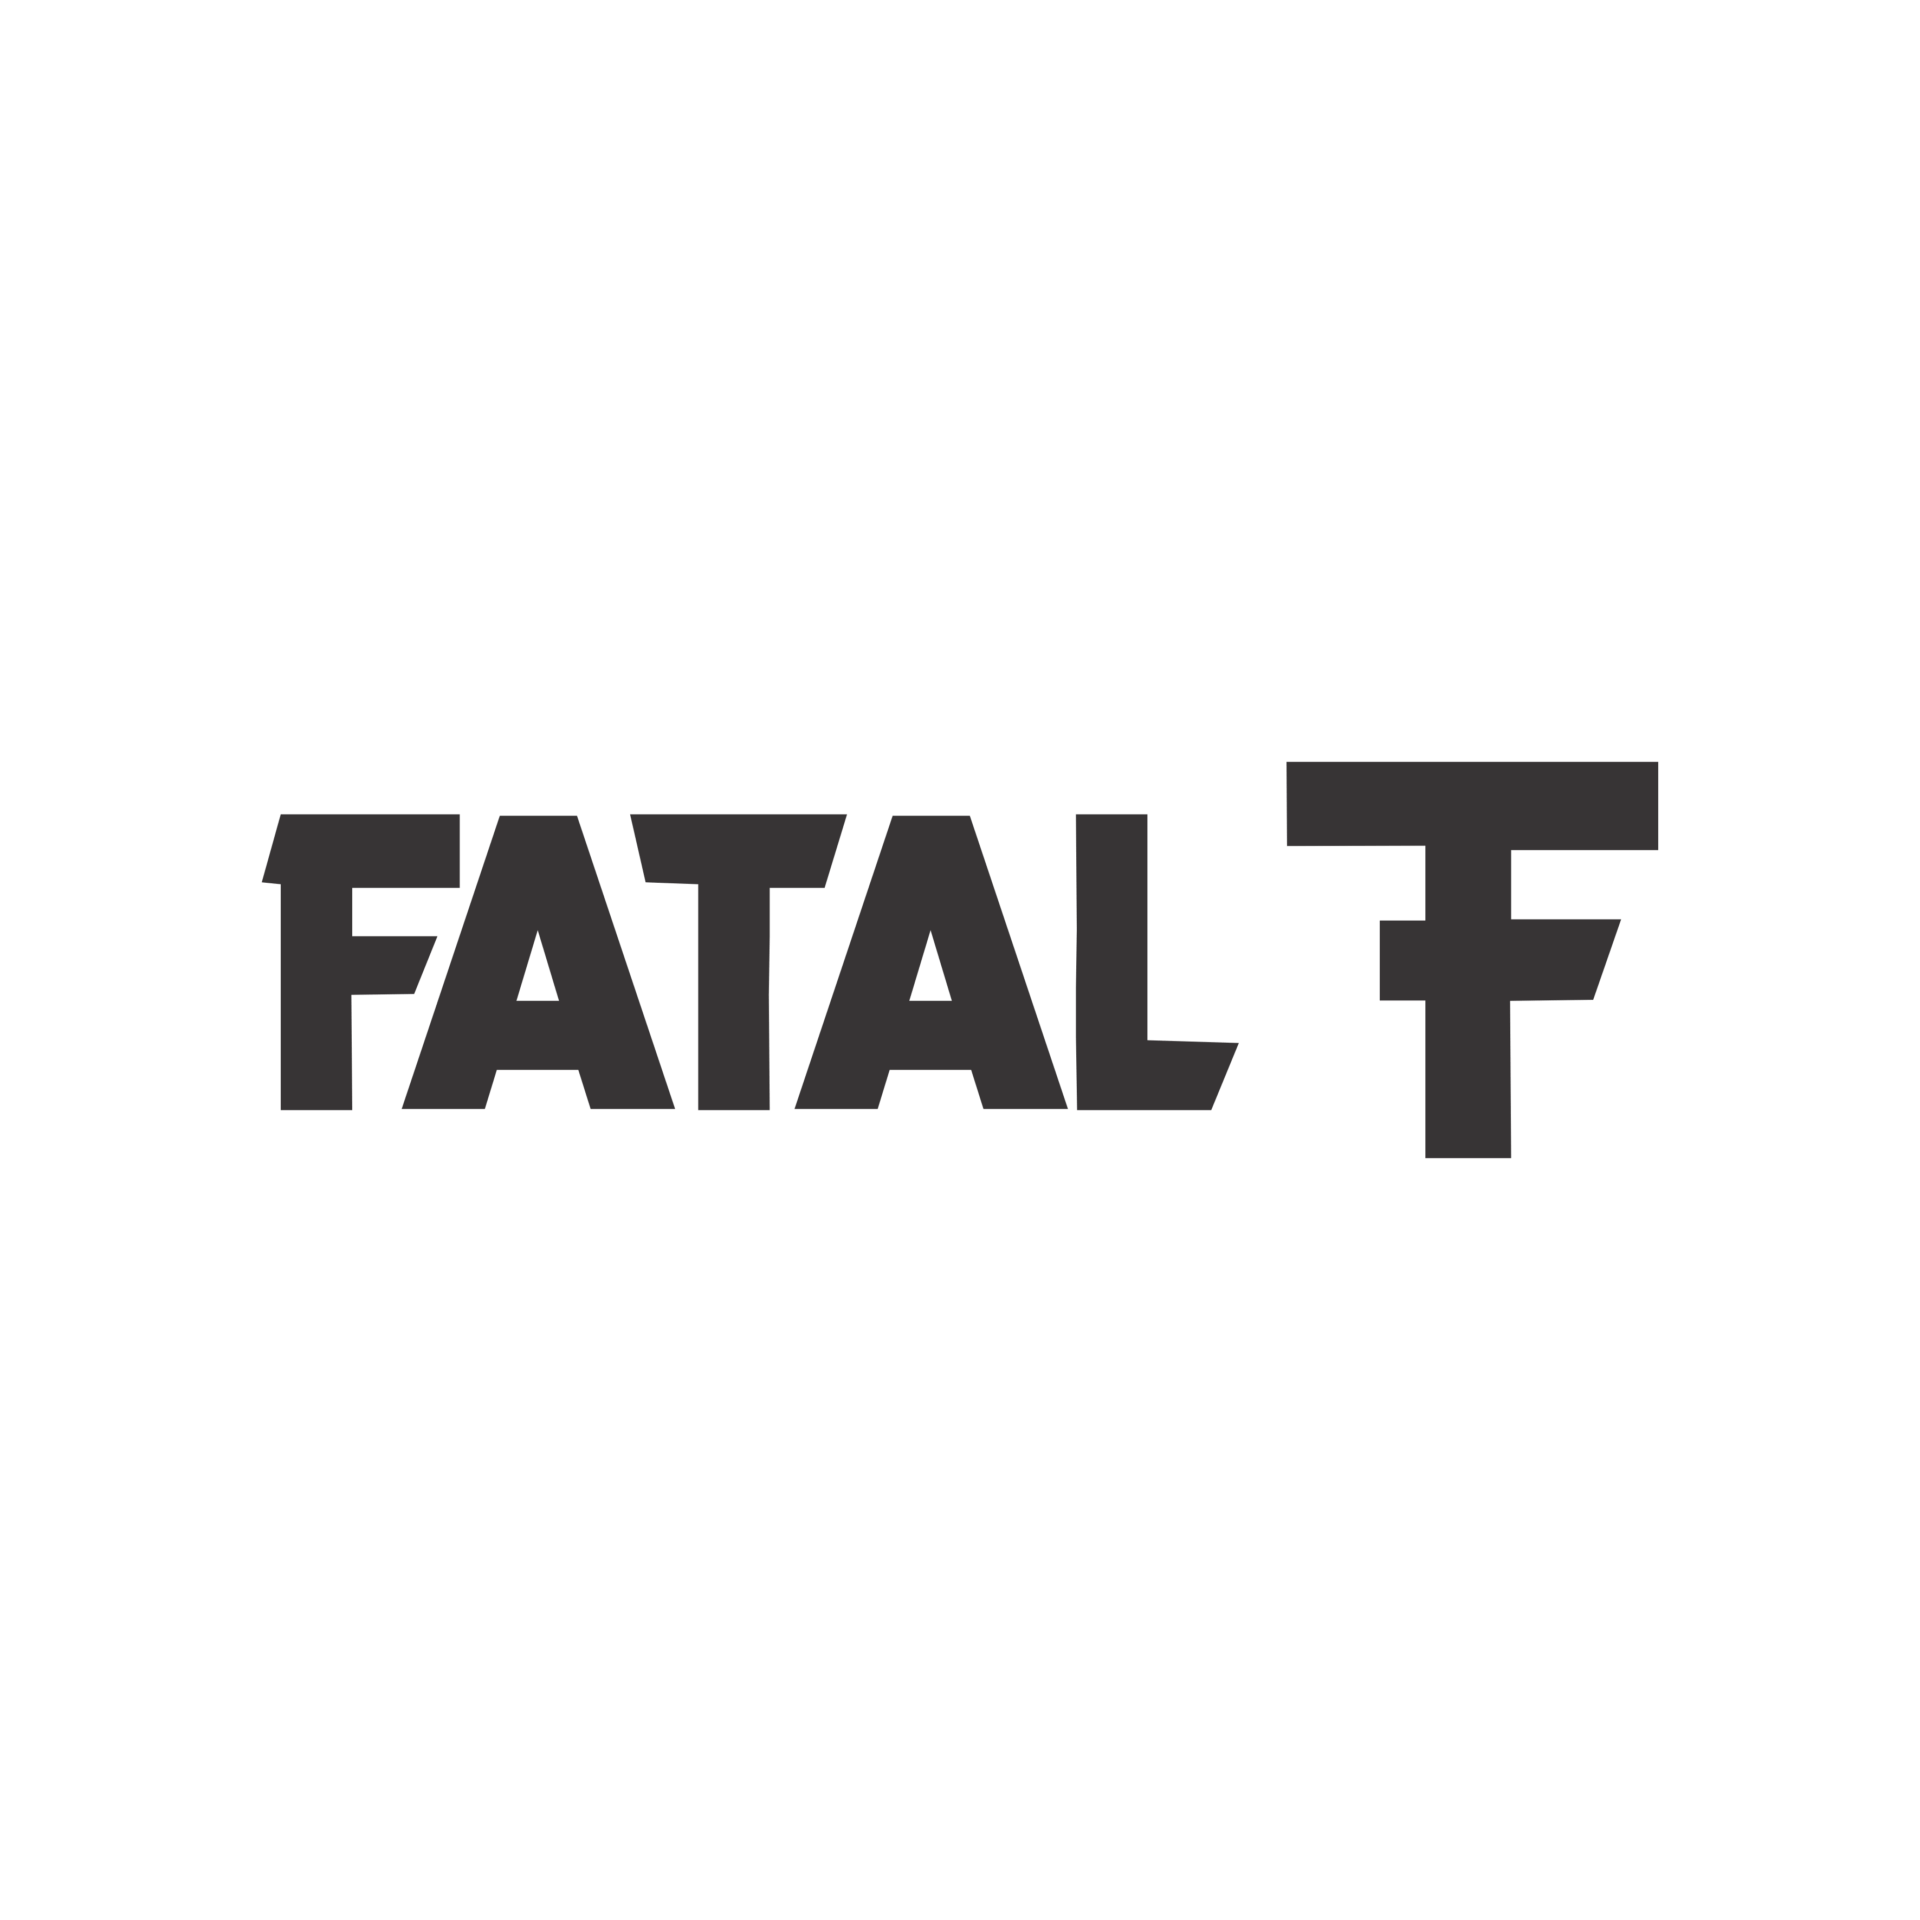 Fatal : Brand Short Description Type Here.